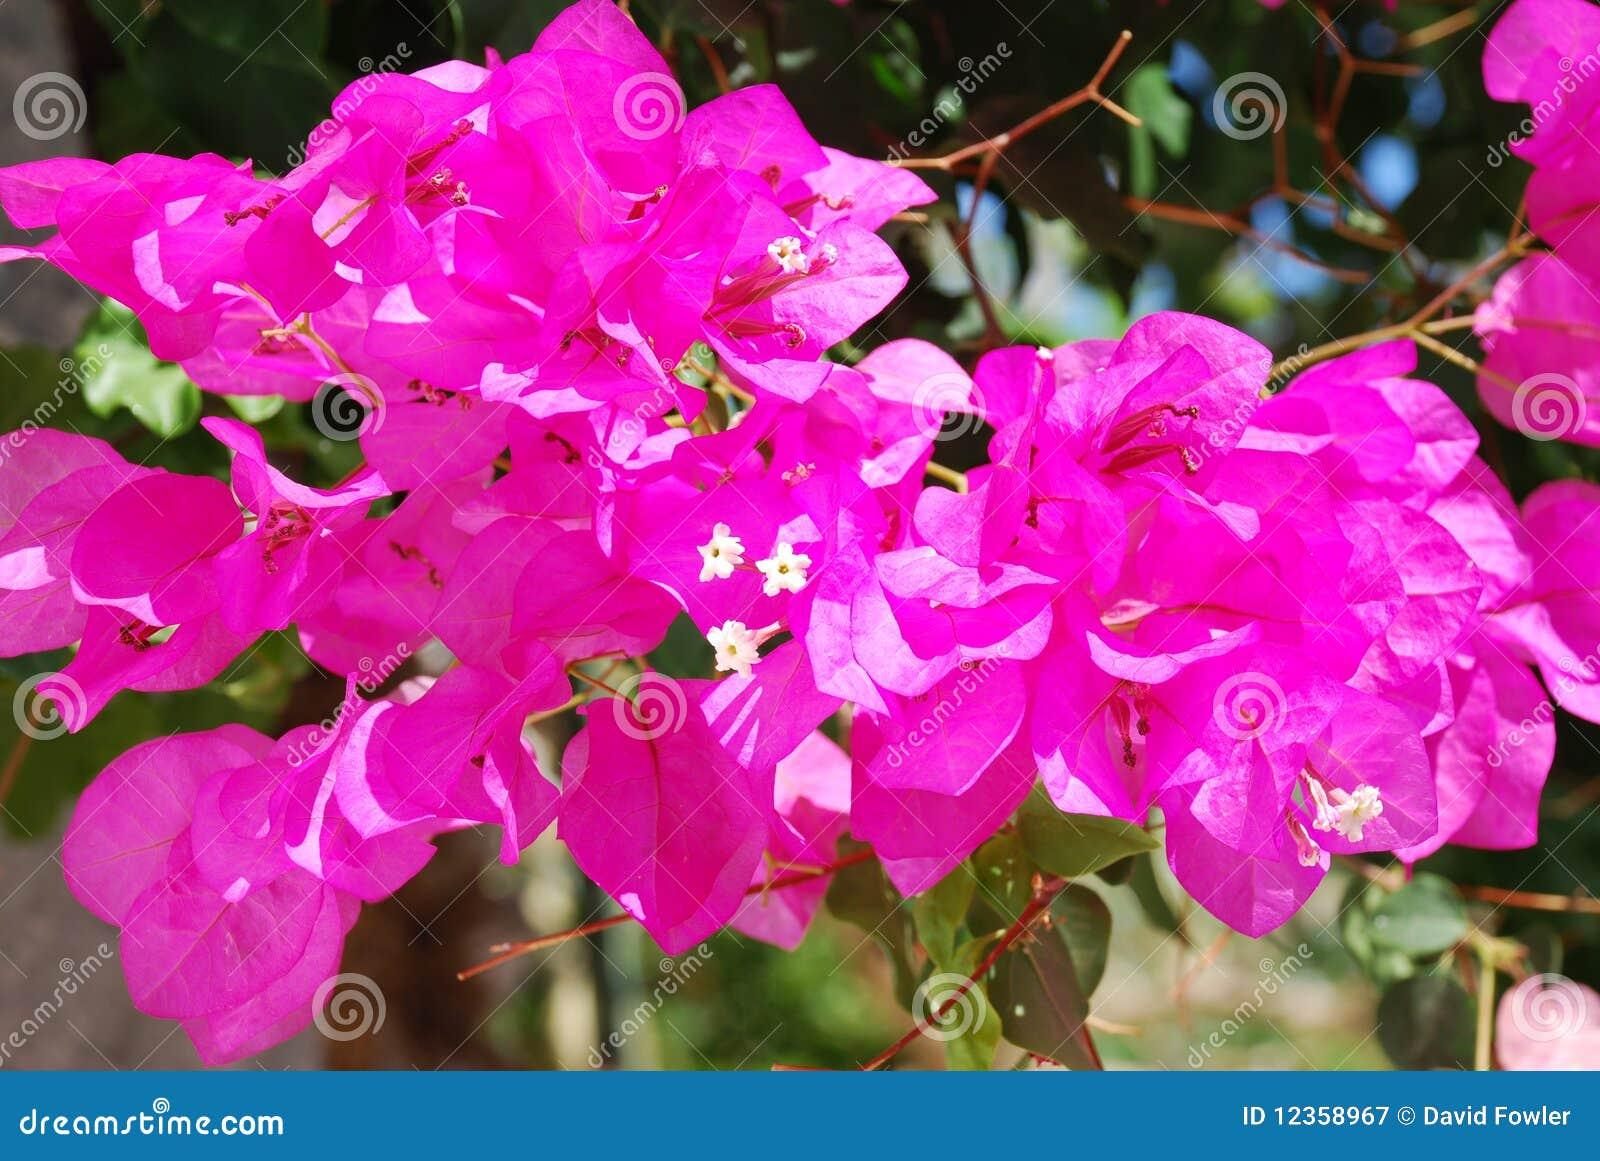 Bougainvillea flower greece stock image image of bougainvillea bougainvillea flower greece mightylinksfo